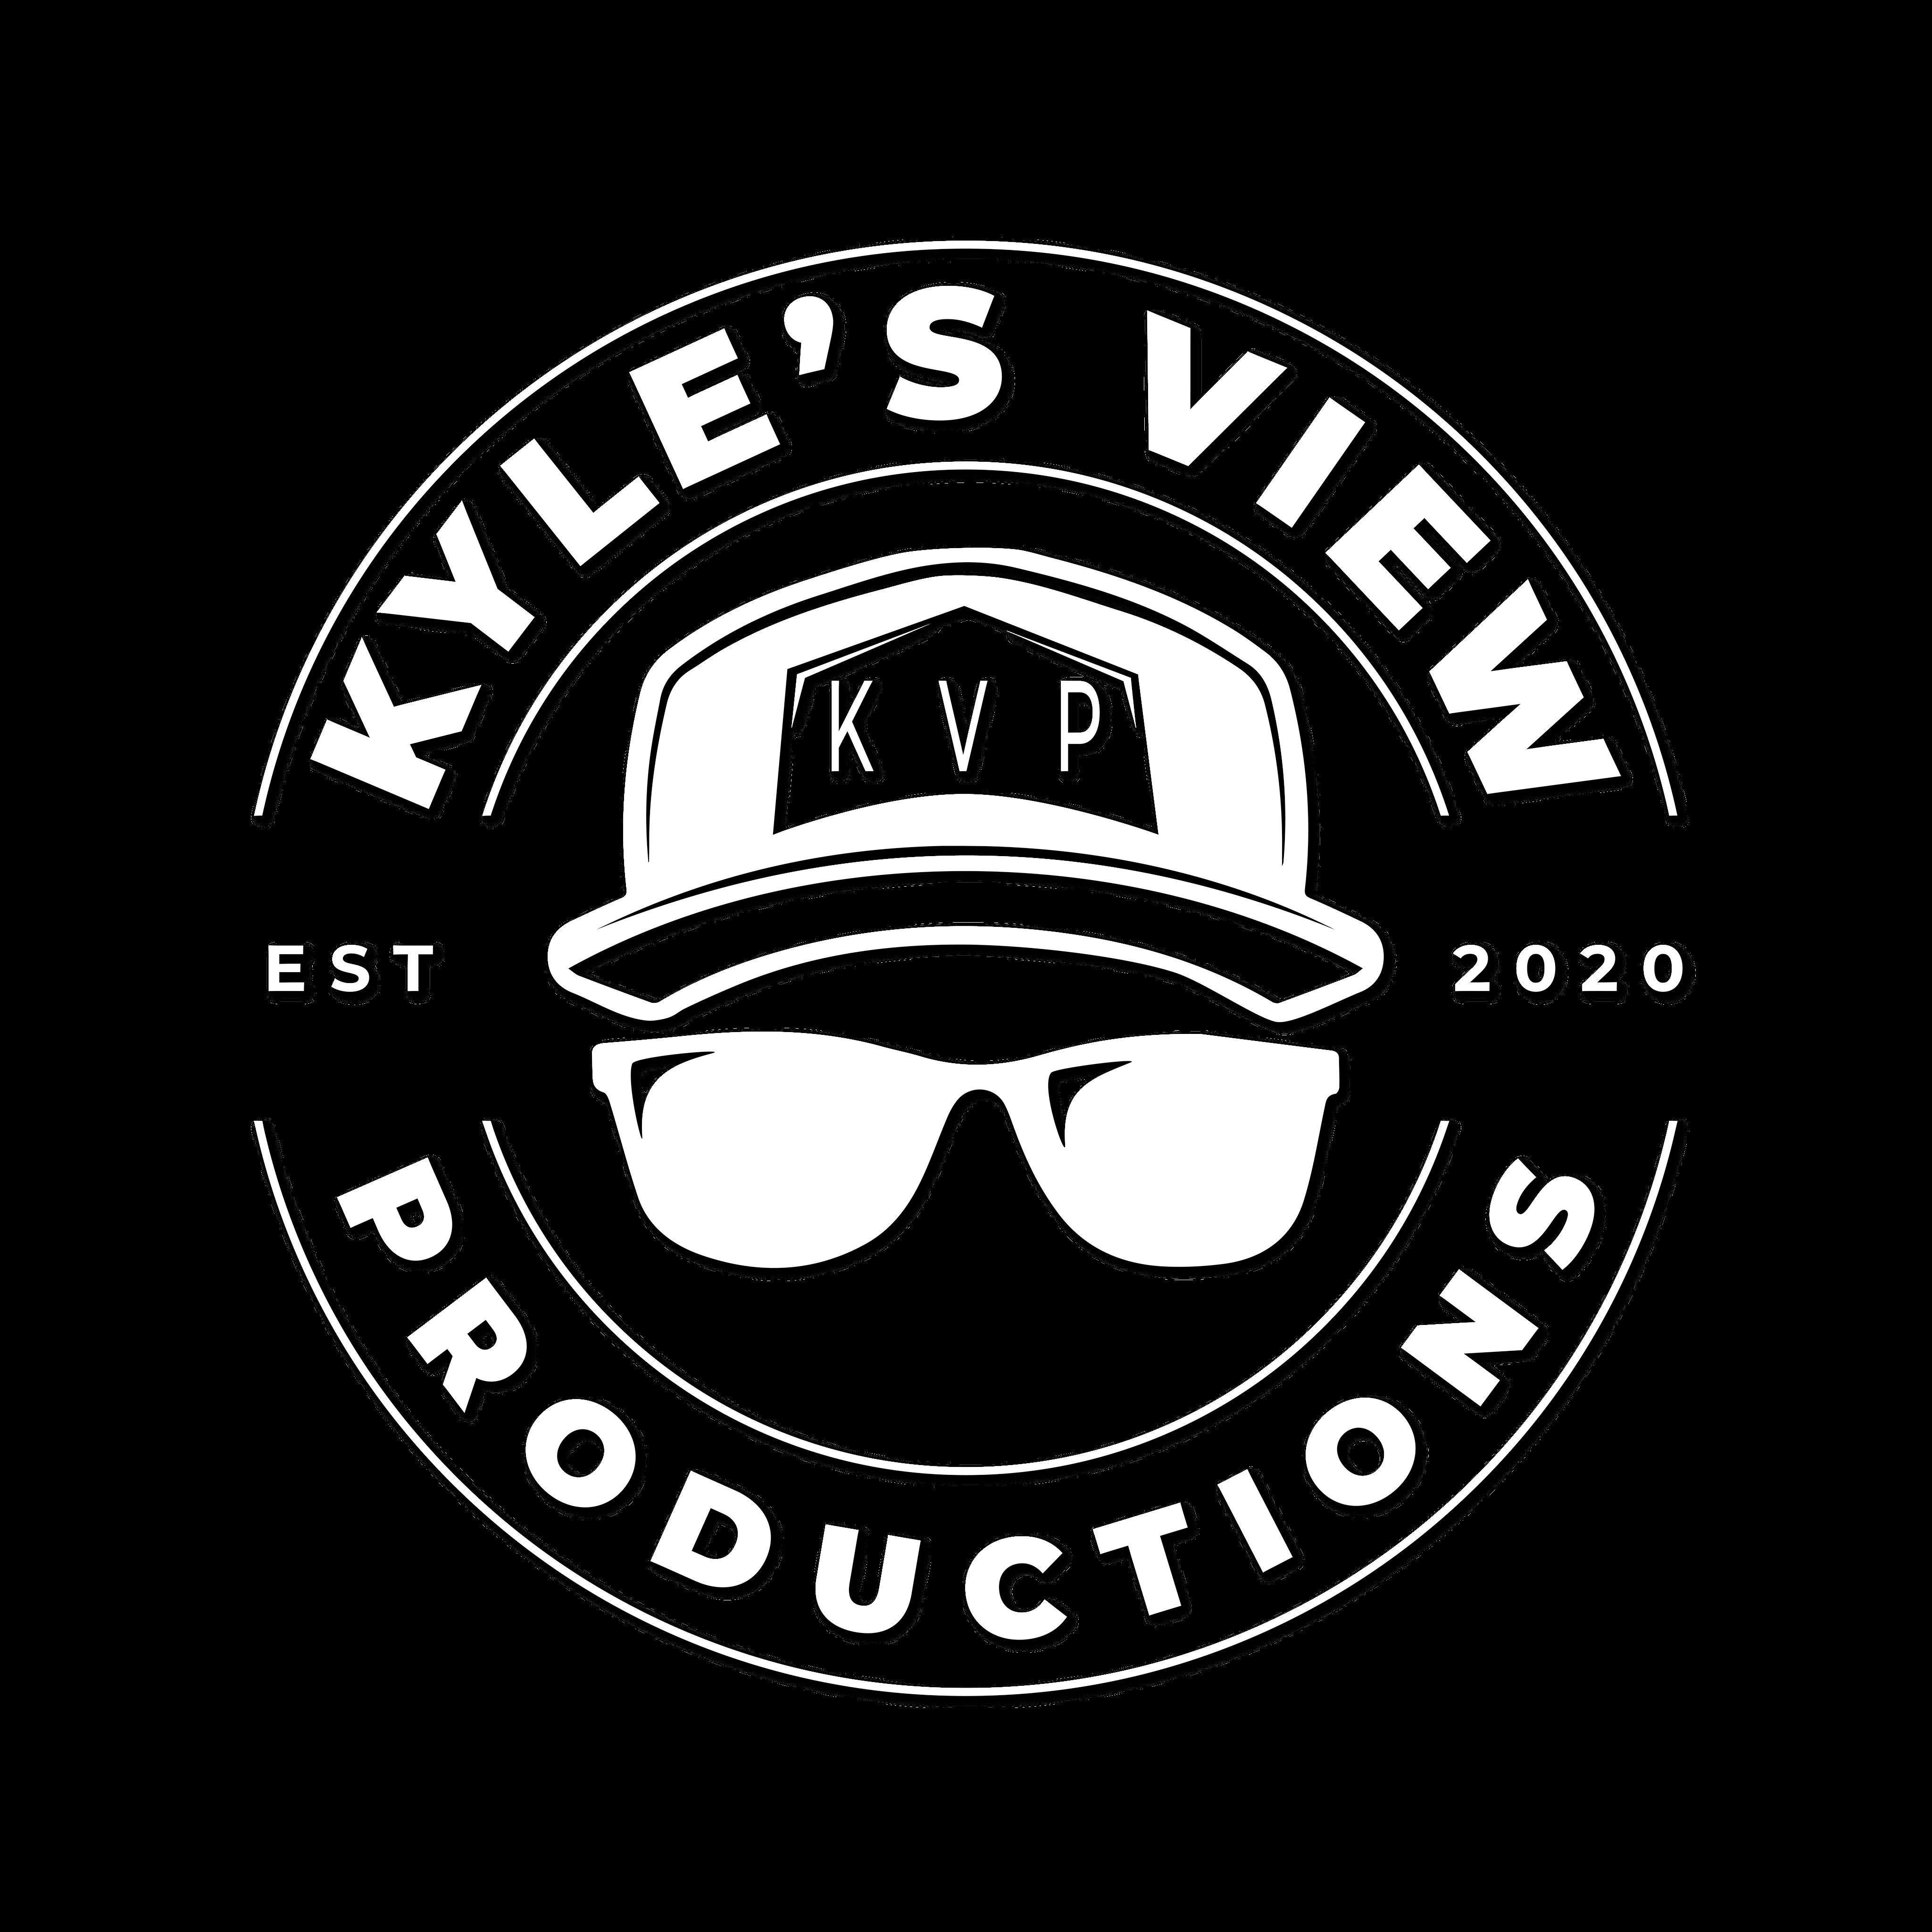 Kyle Byers